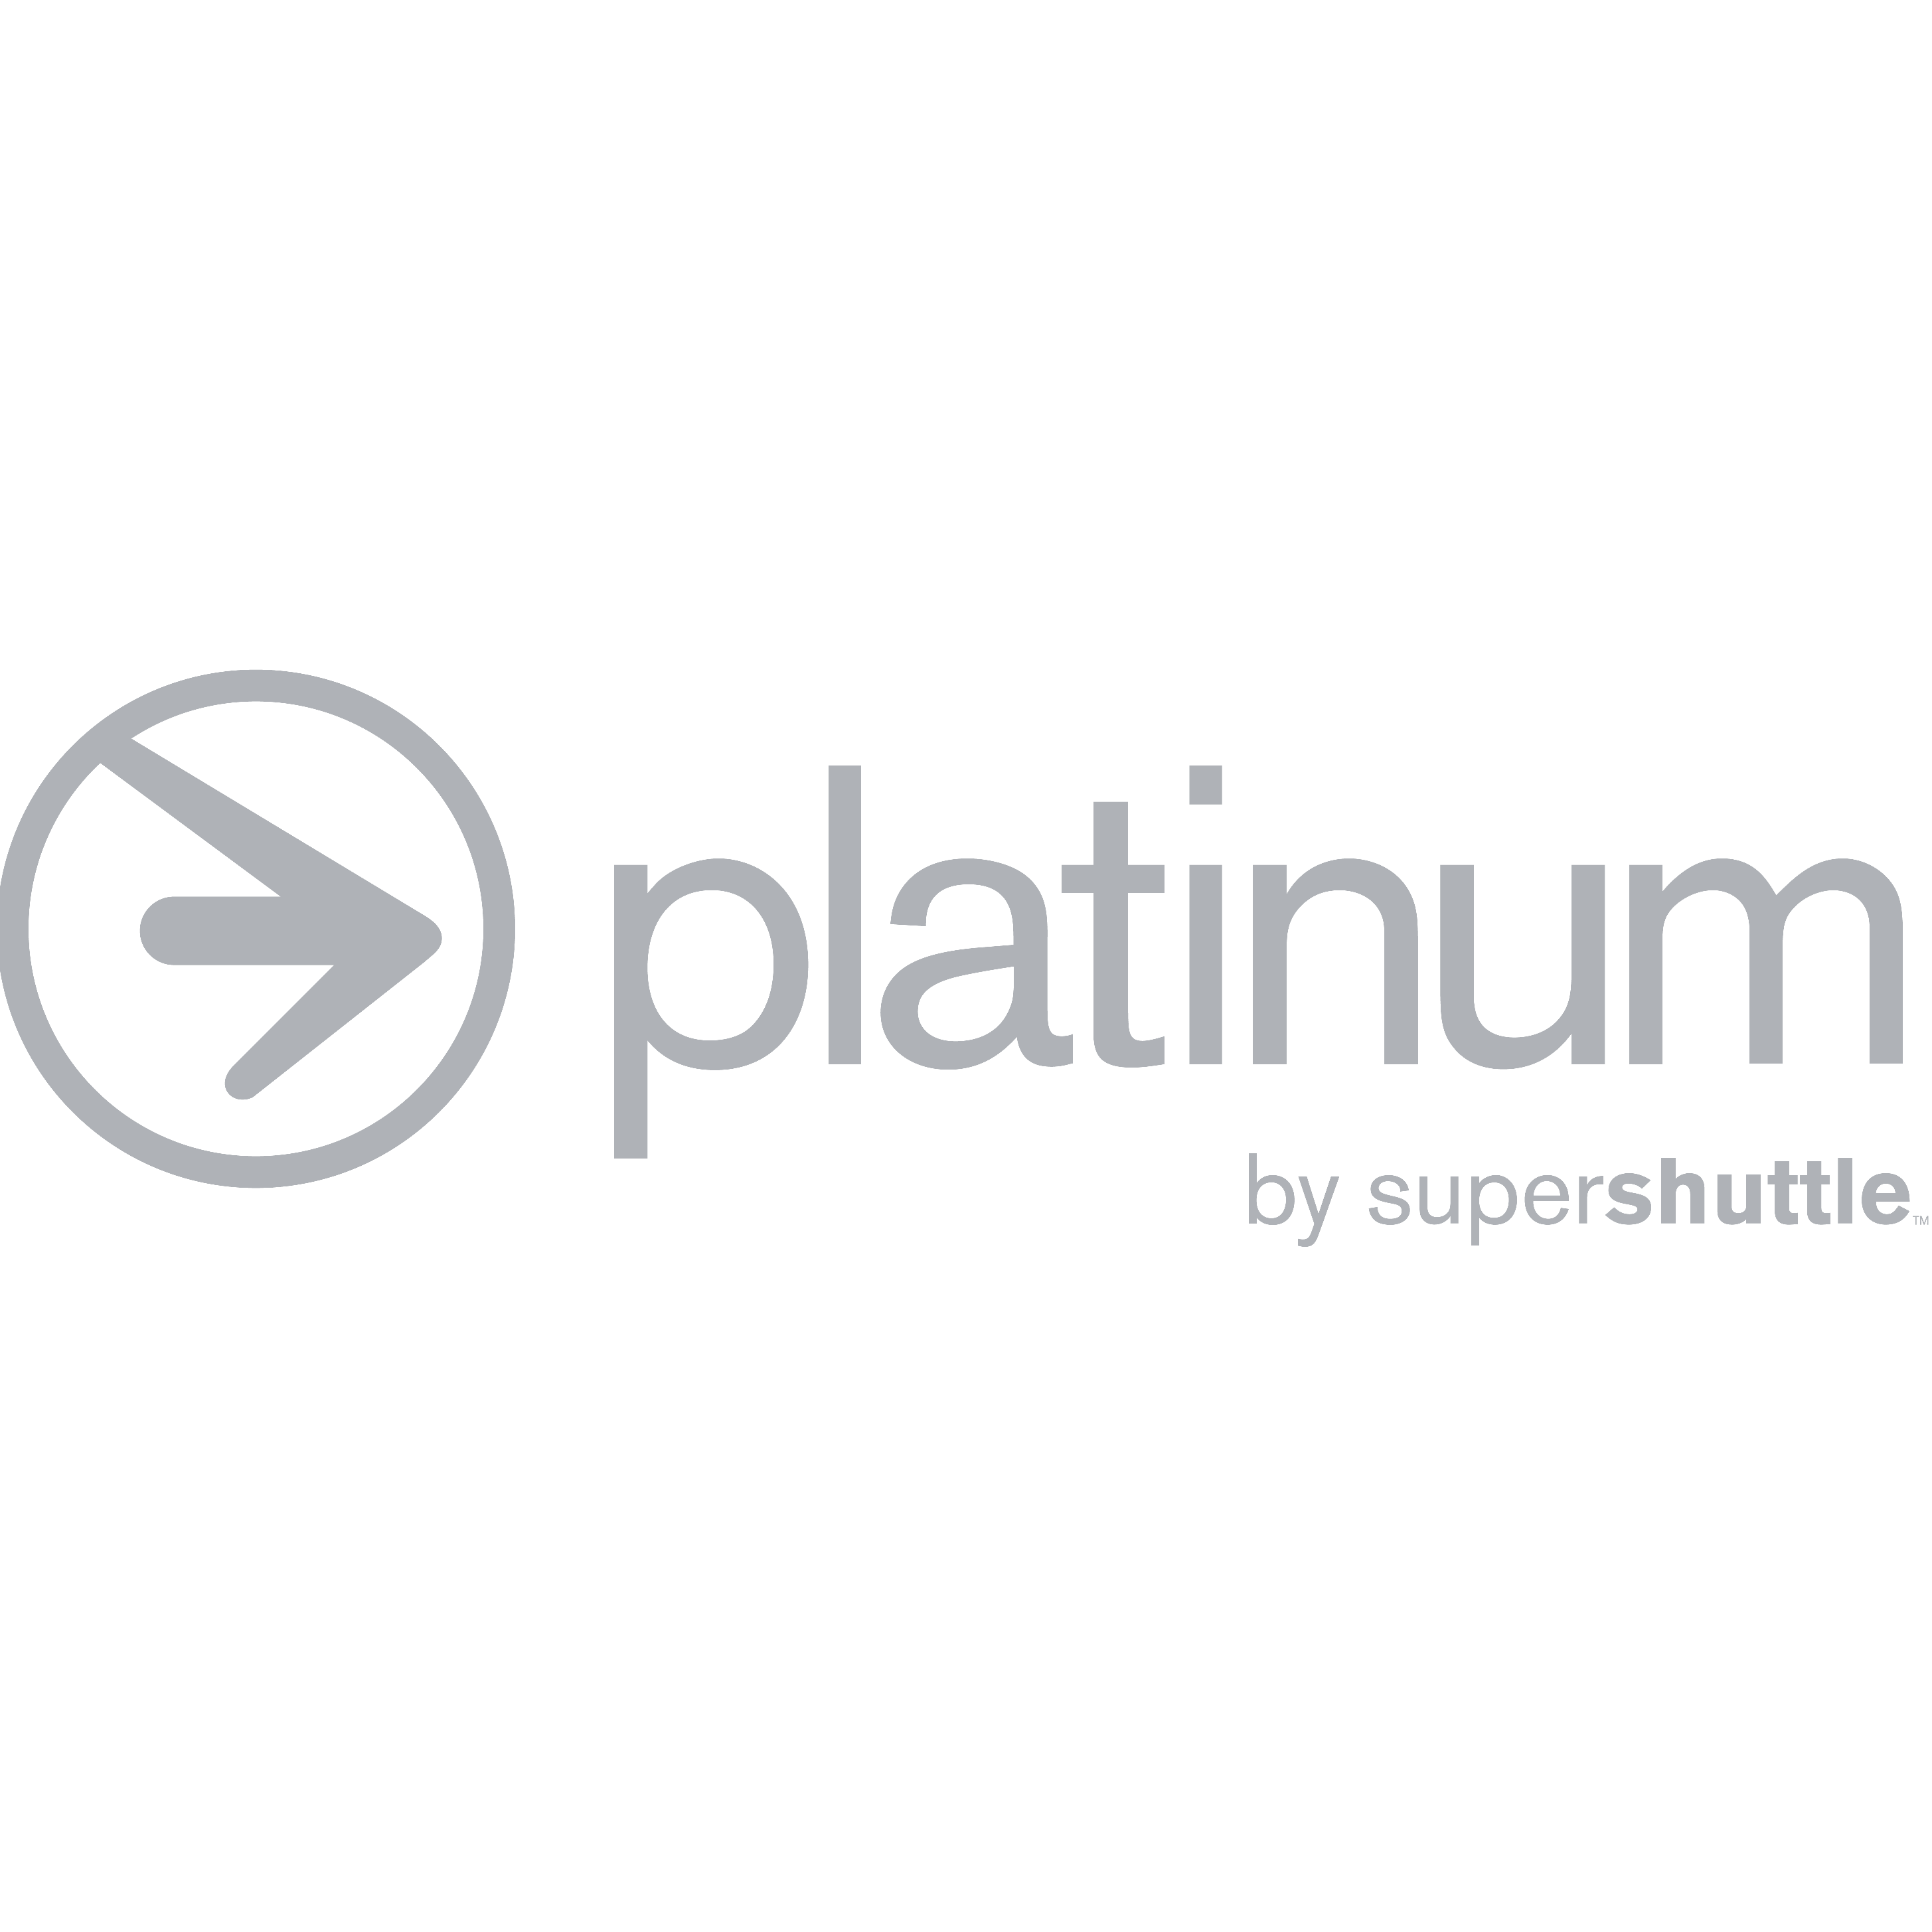 Platinum by Super Shuttle